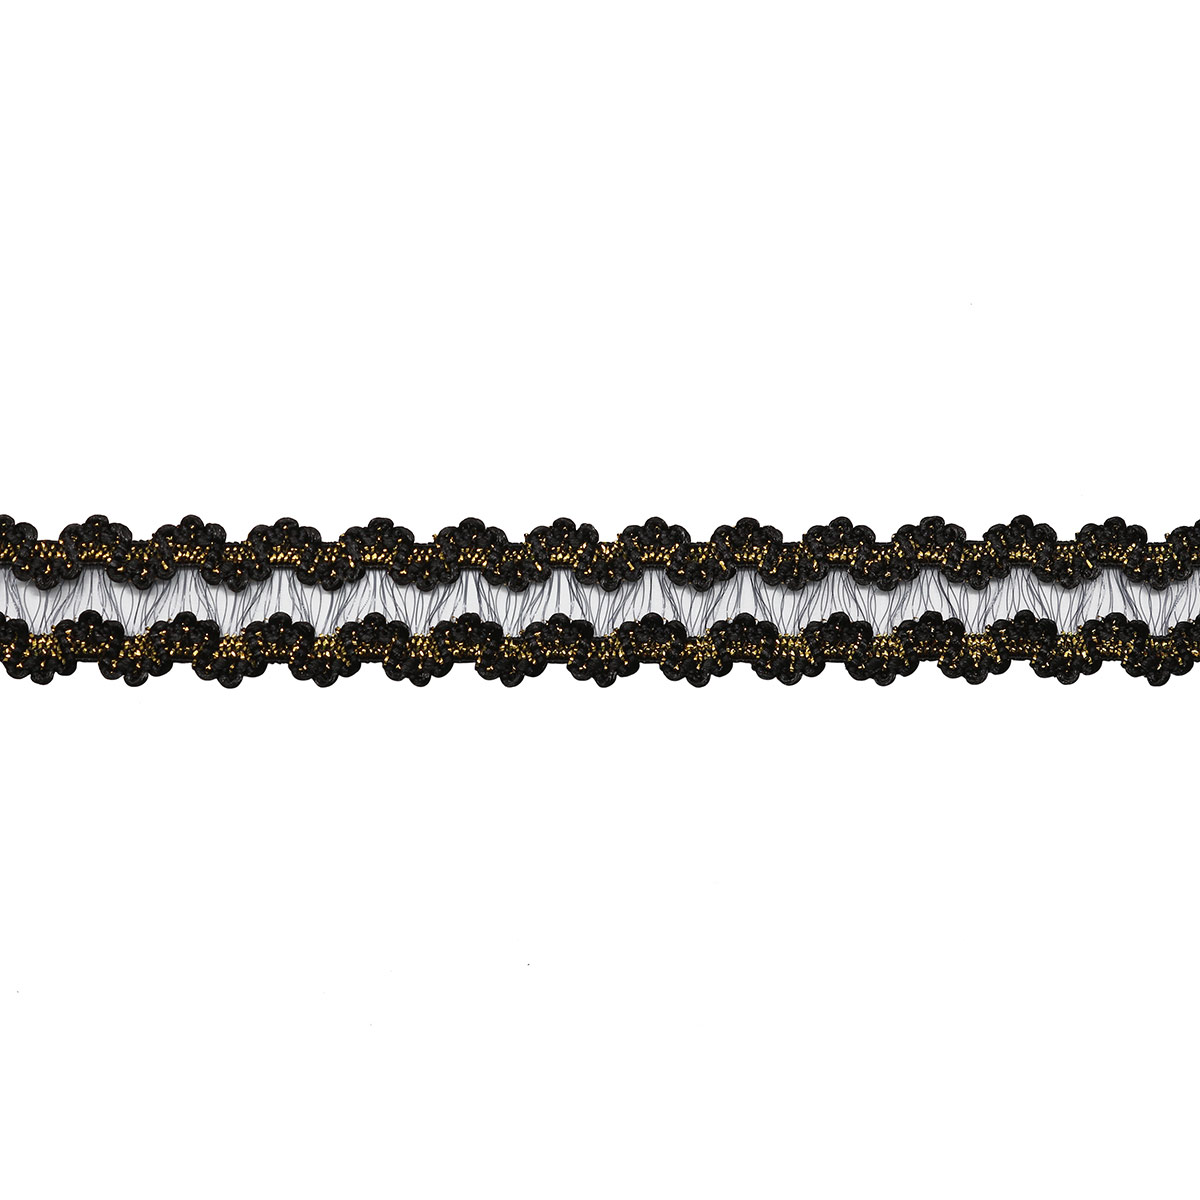 1AS-163 Тесьма-рюш эластичная двухсторонняя 12мм*22,86м